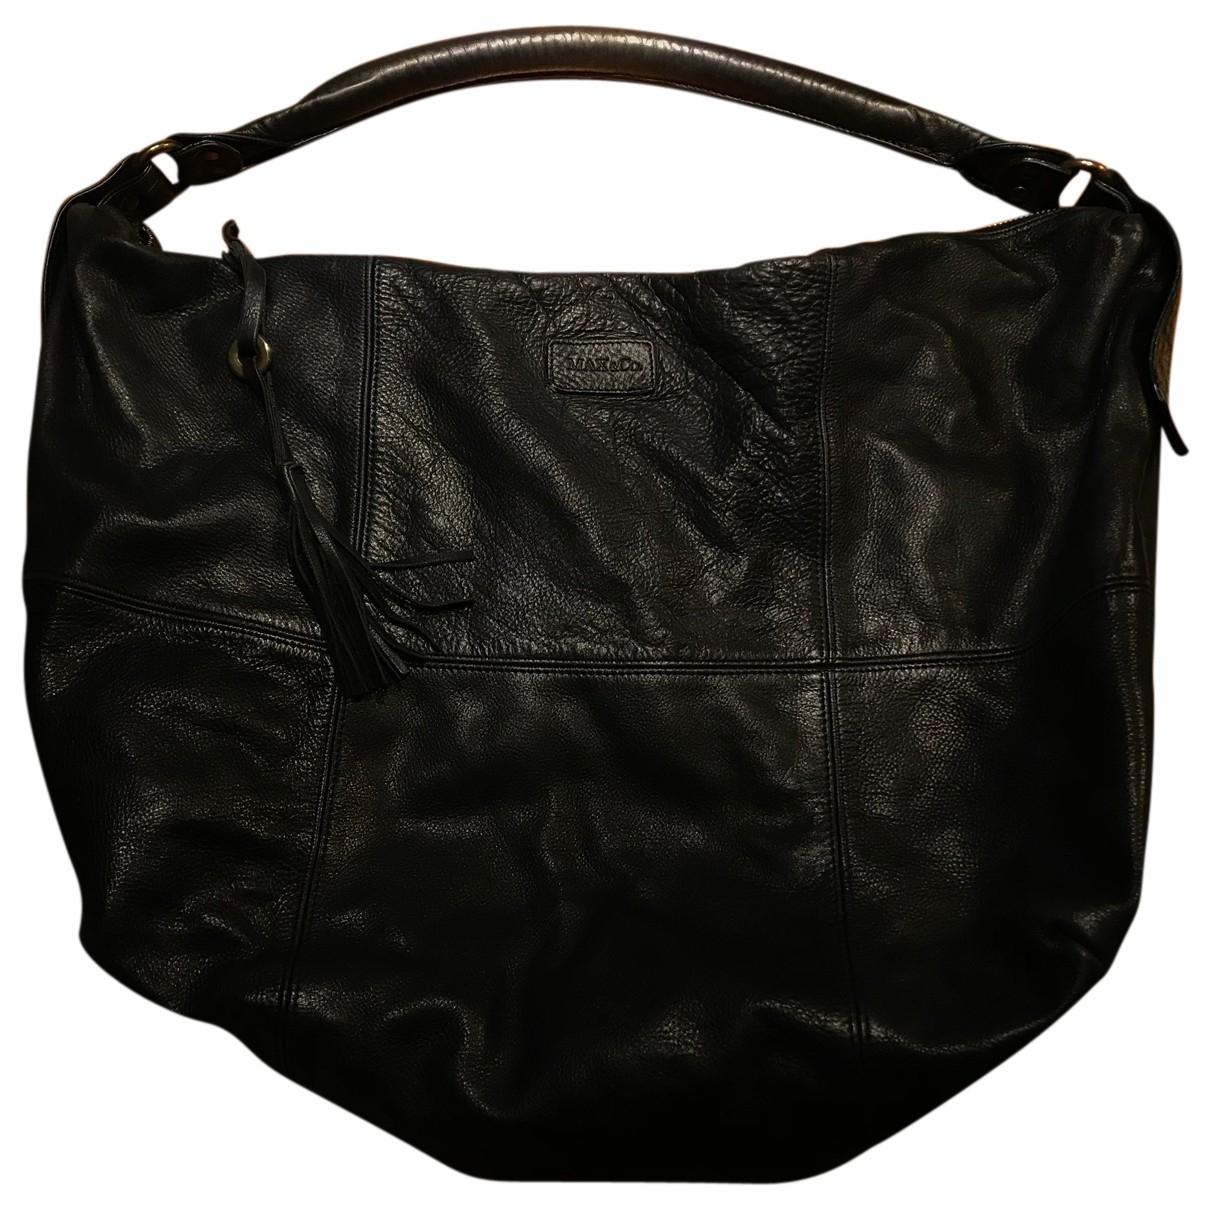 Max & Co N Black Leather handbag for Women N